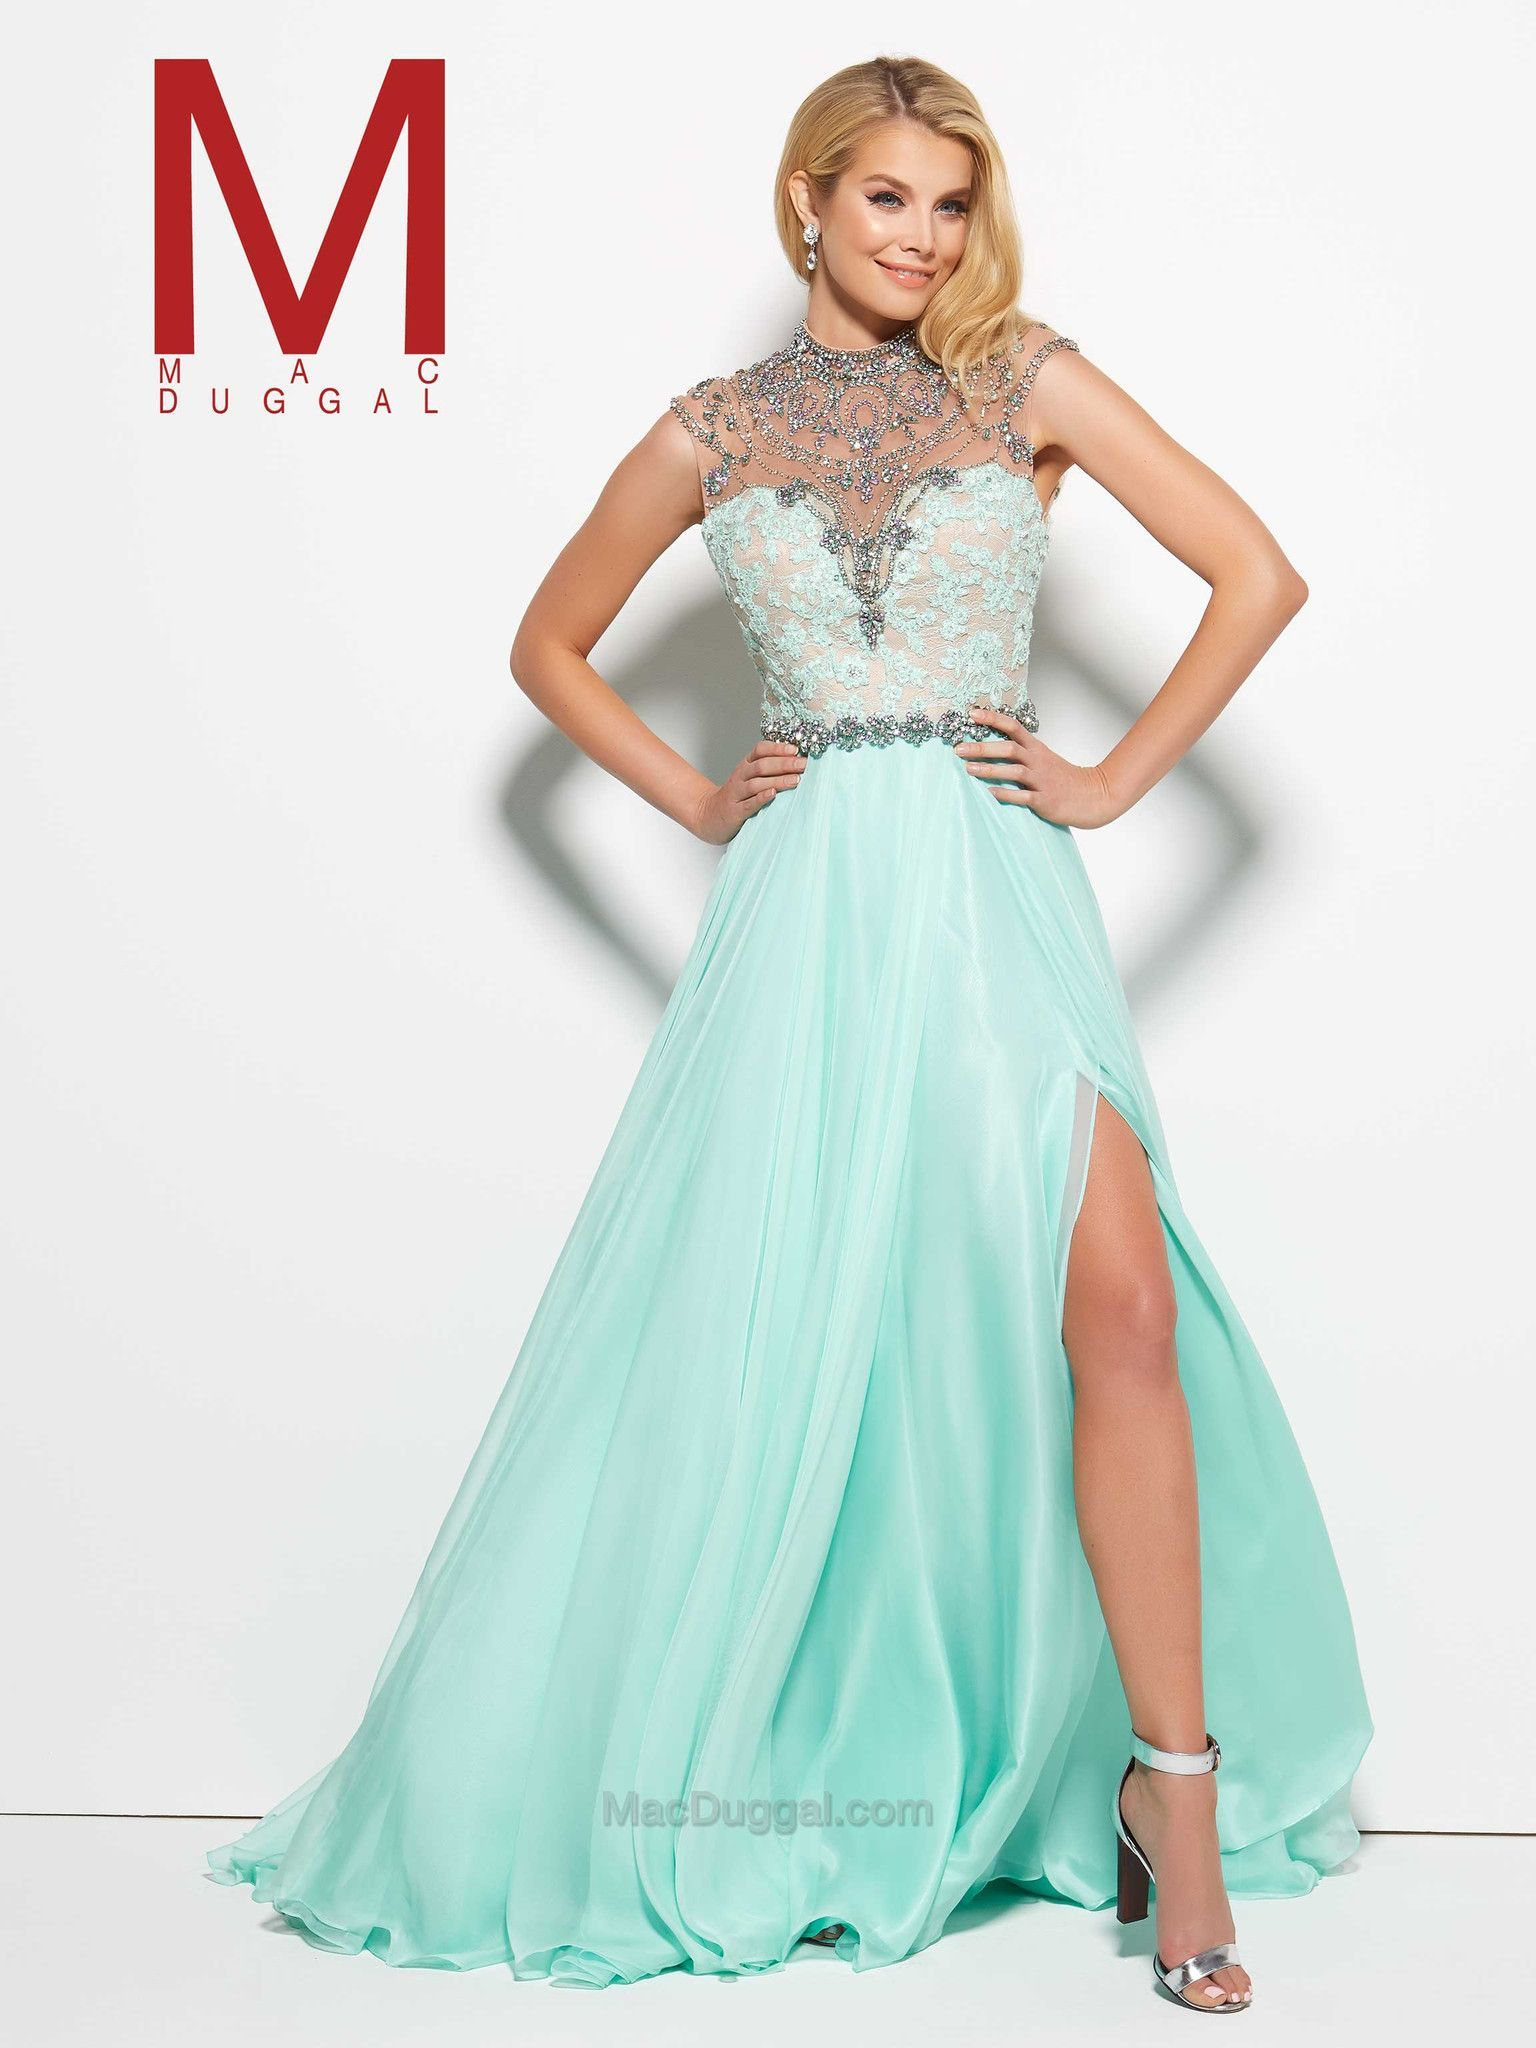 Pin by Jenna Estes on formal dresses   Pinterest   Macs, Drop and Box